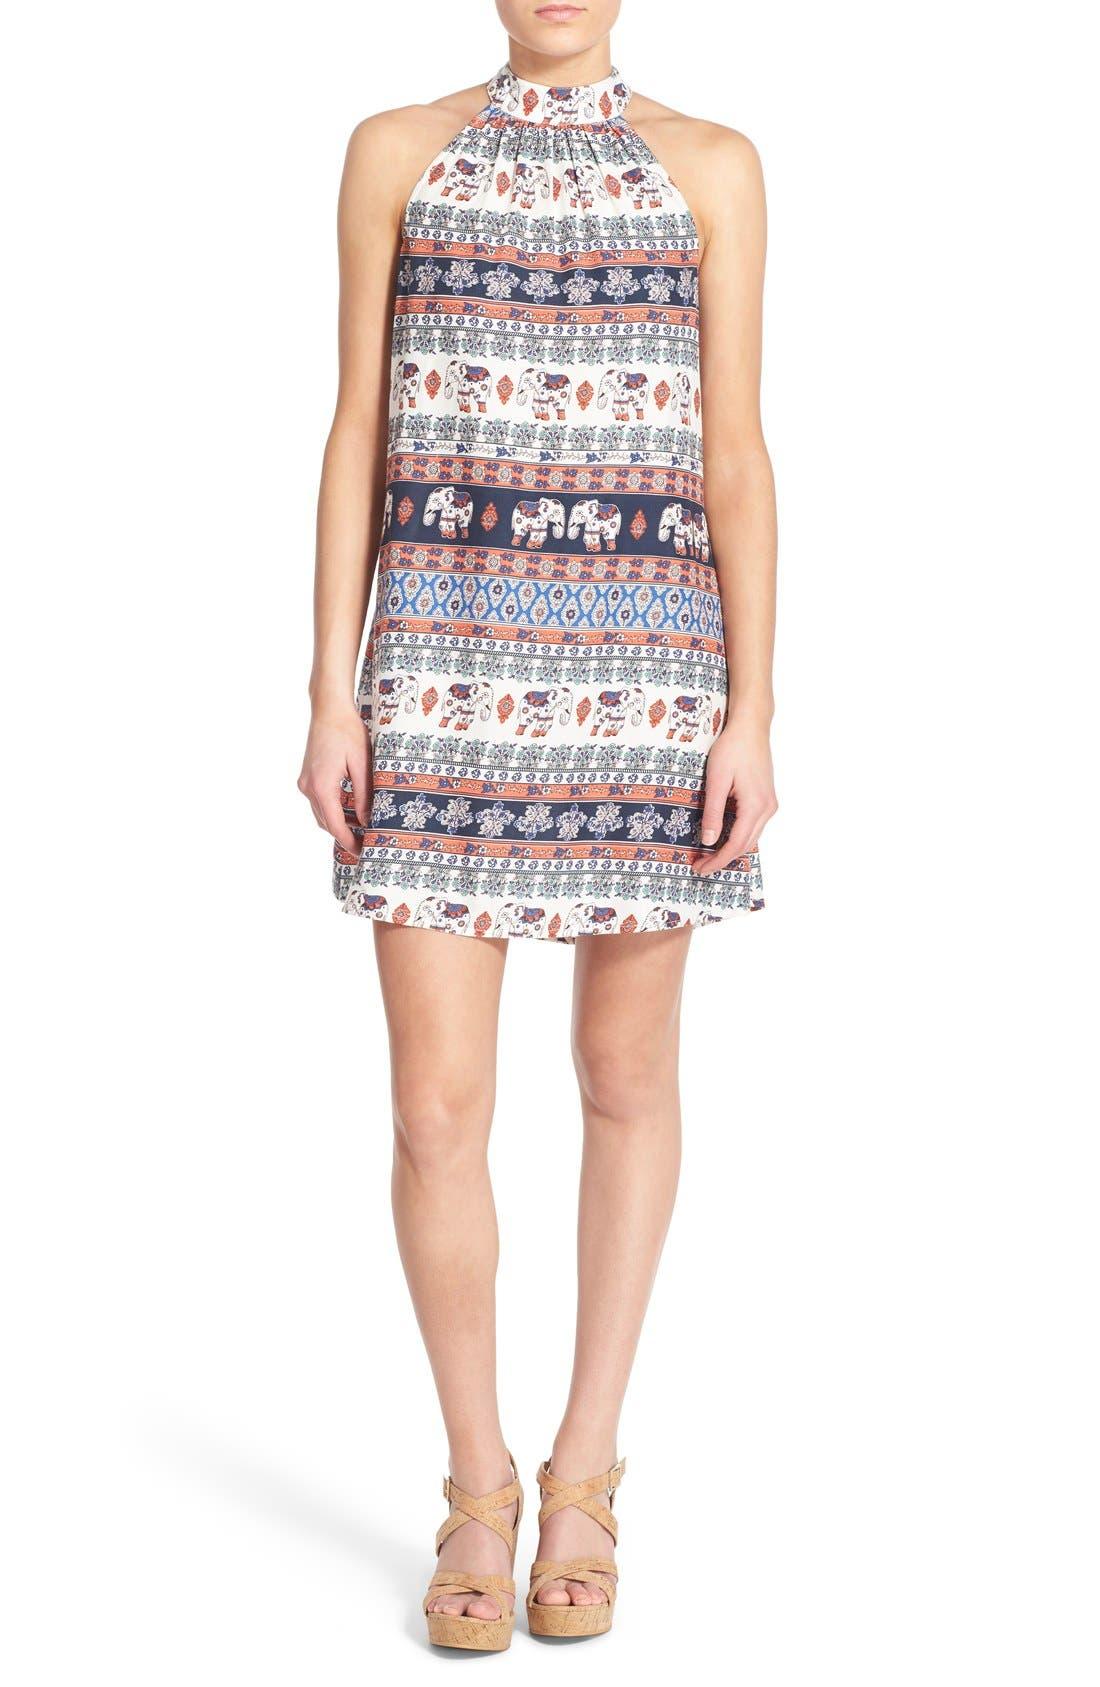 Alternate Image 1 Selected - Band of Gypsies Print Mock Neck Shift Dress